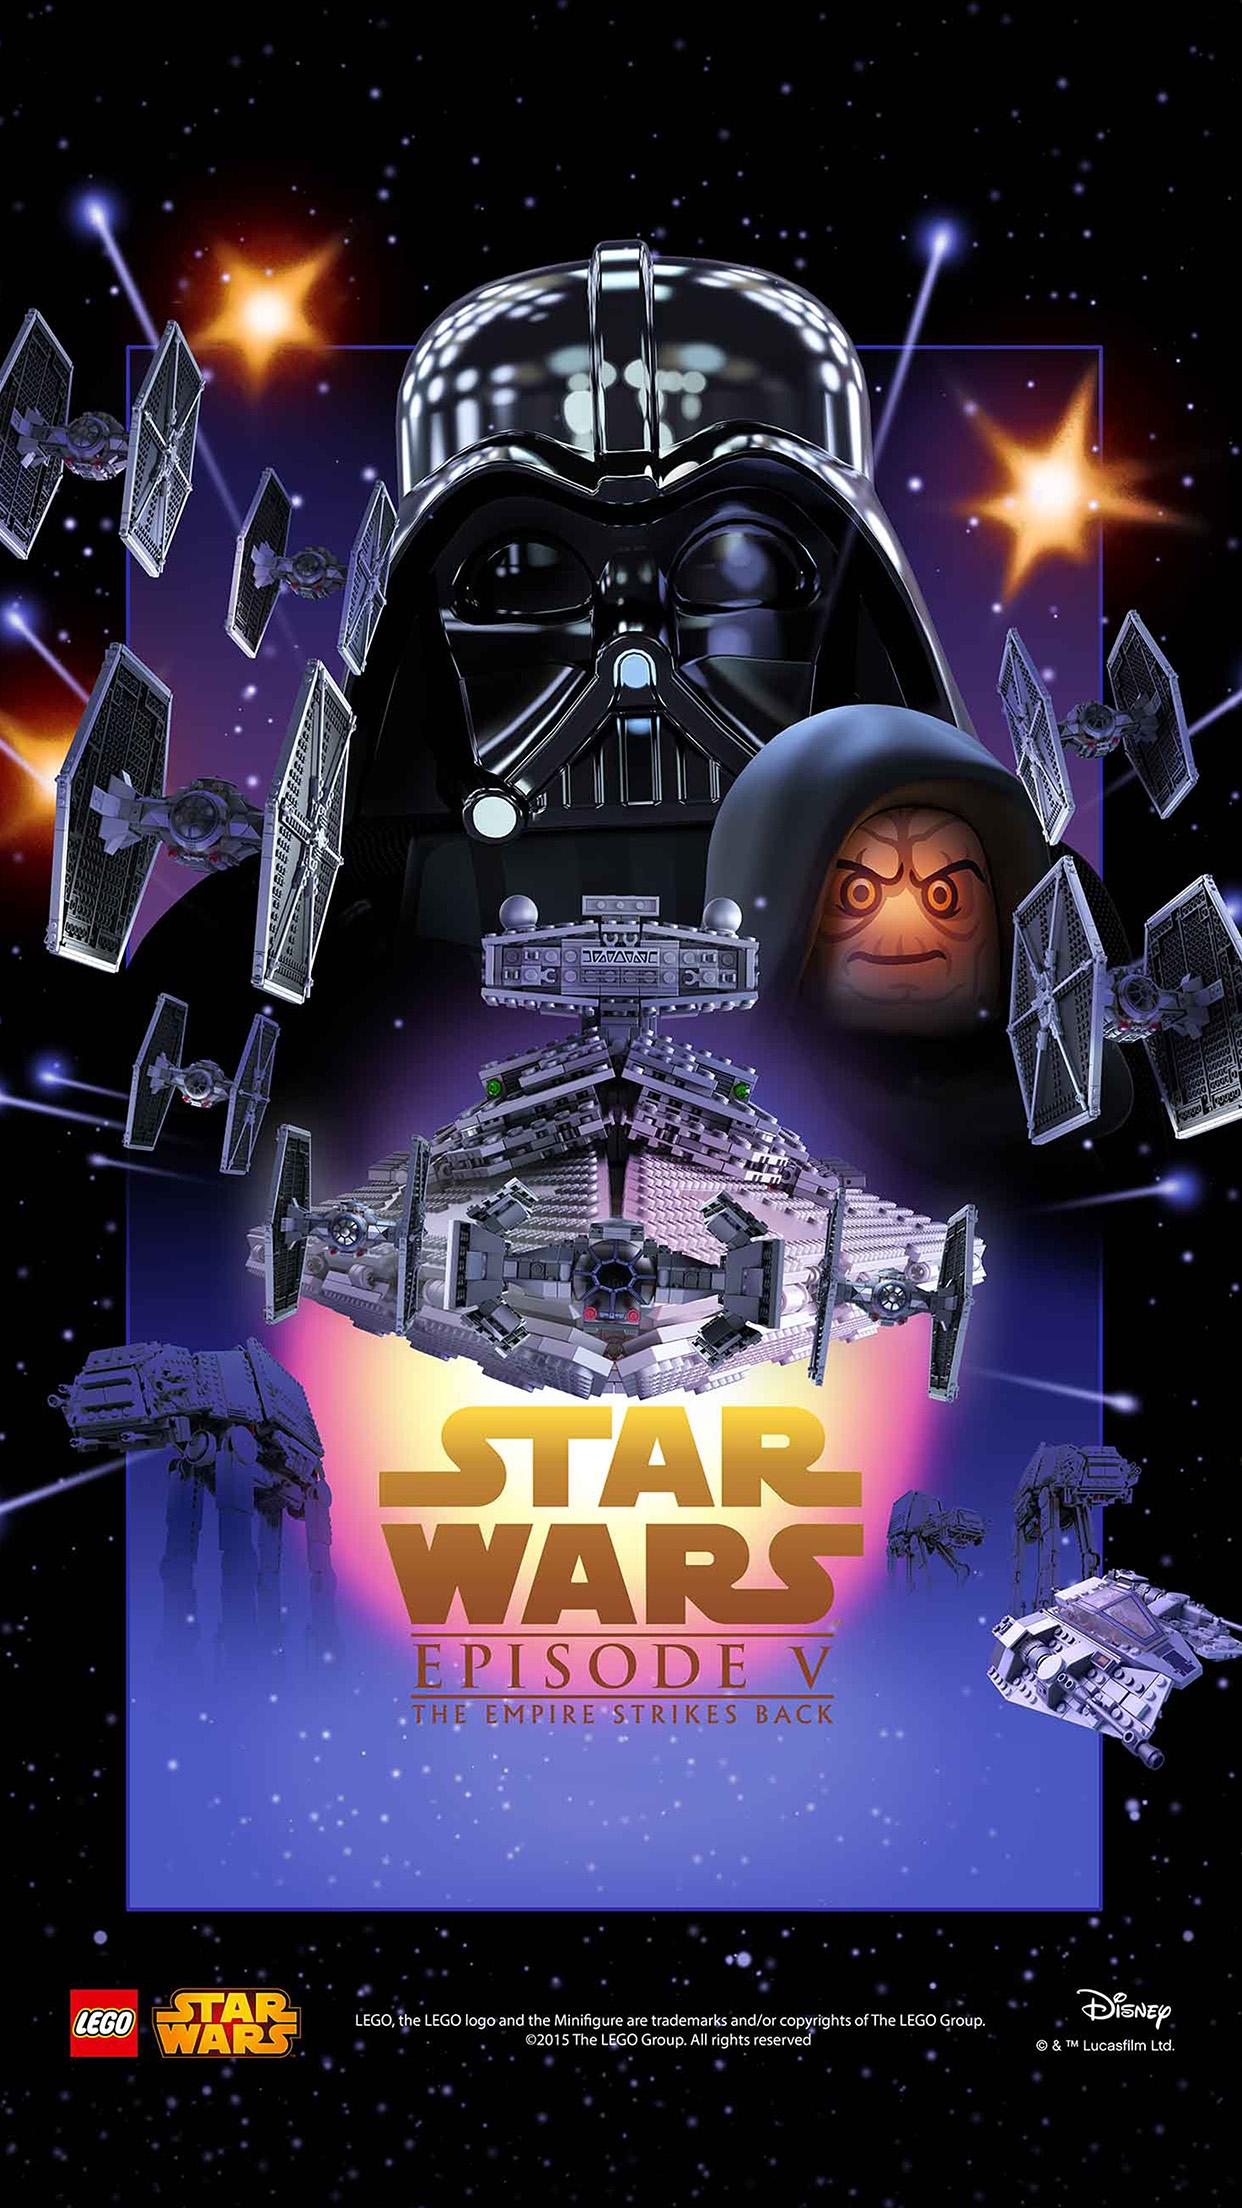 Ap23 Starwars Lego Episode 5 Empire Strikes Back Film Art Wallpaper